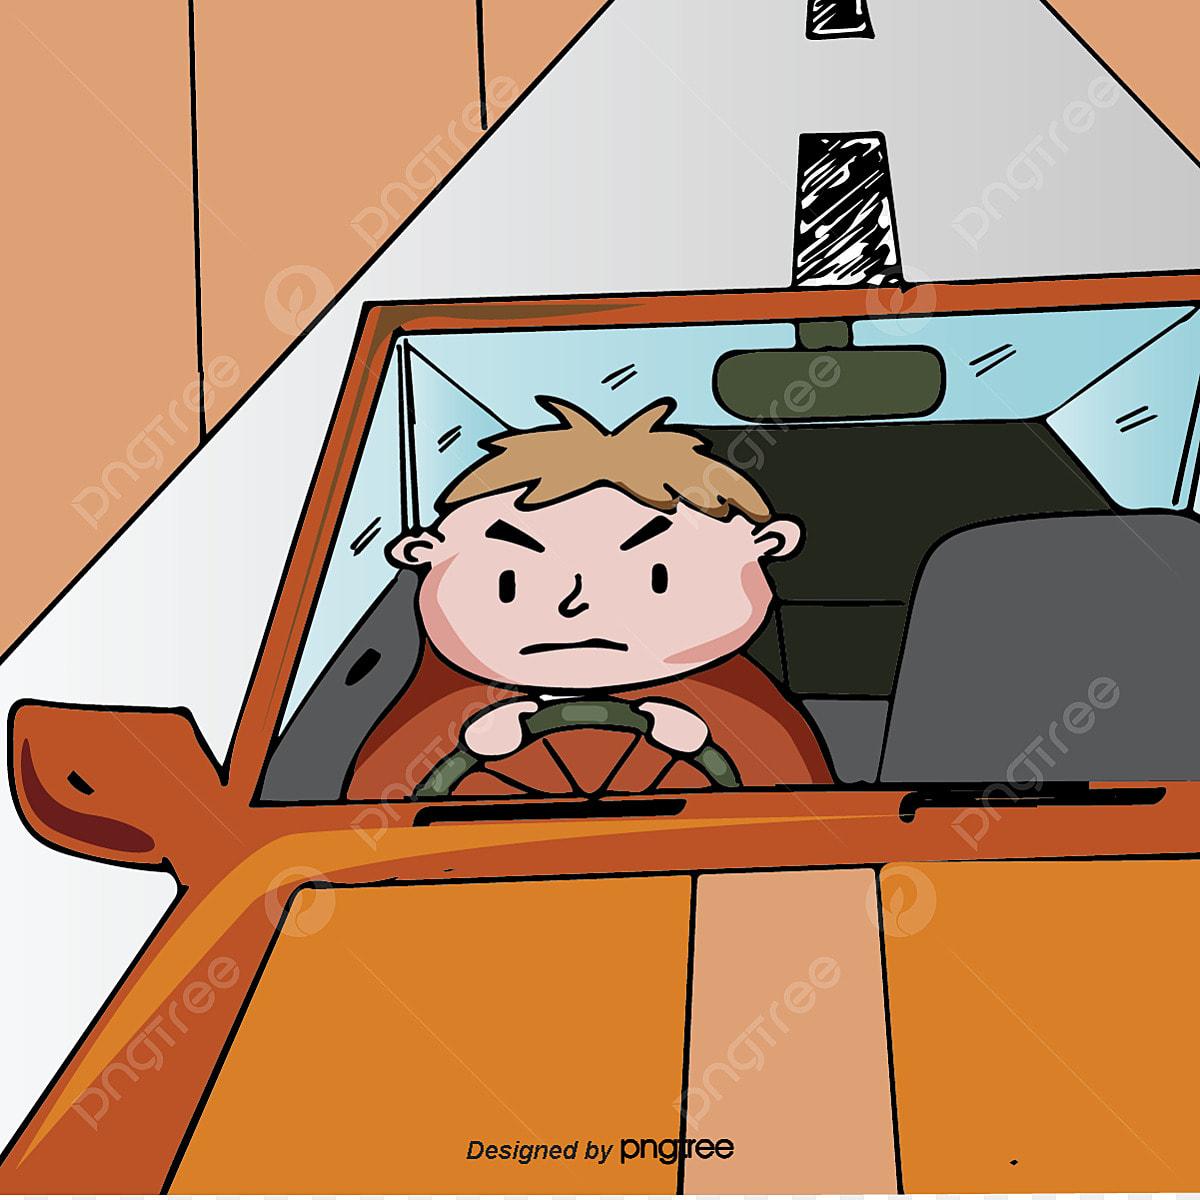 Unduh 76 Gambar Animasi Orang Marah Lucu Bergerak Terbaru